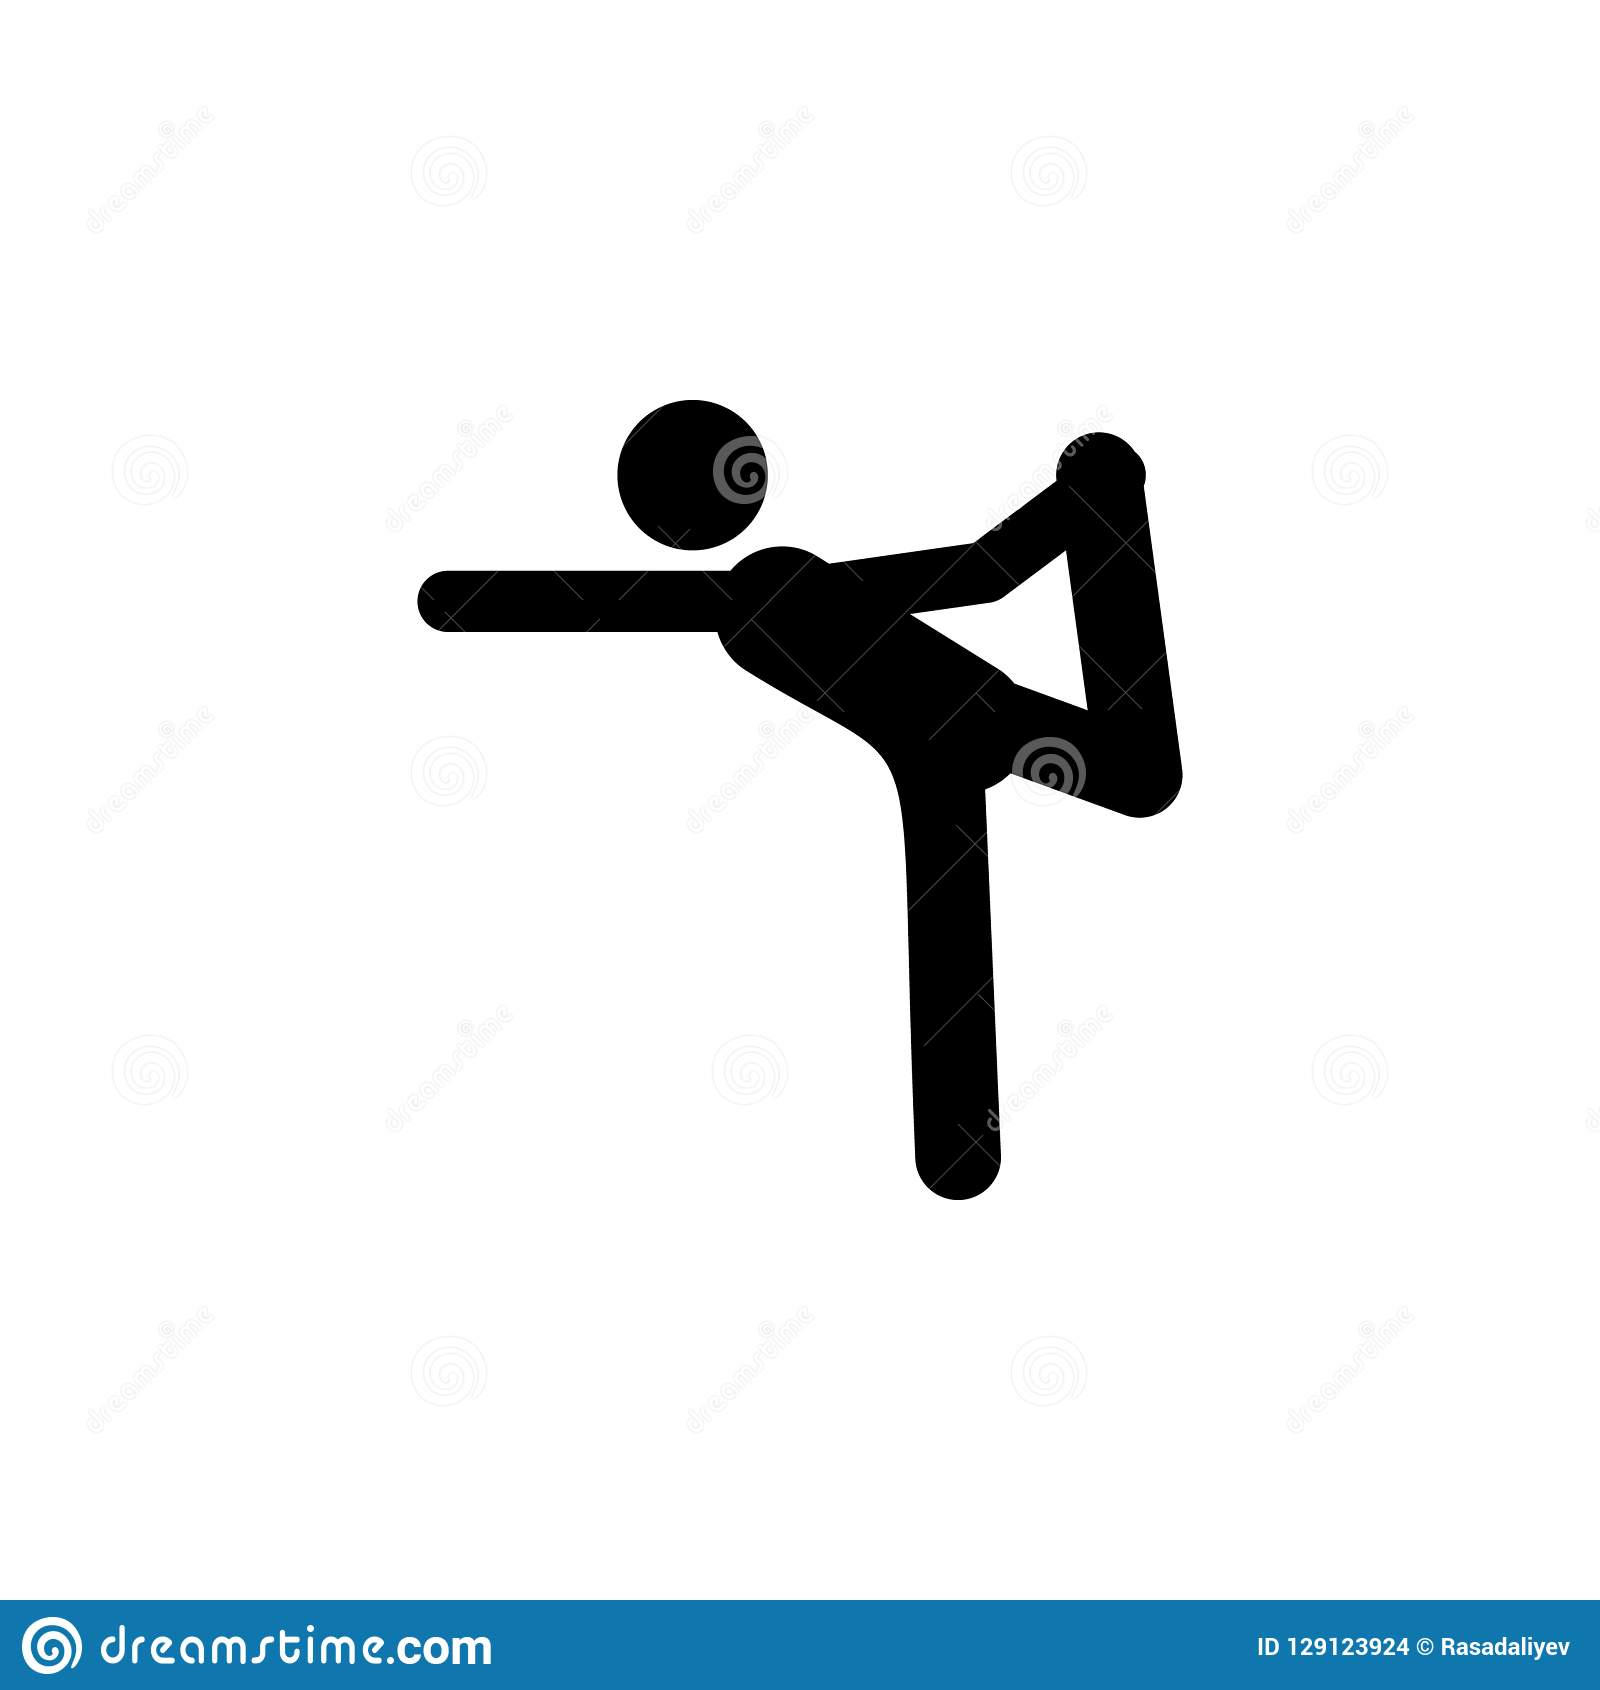 Pose, Man Icon  Element Of Yoga Icons  Premium Quality Graphic